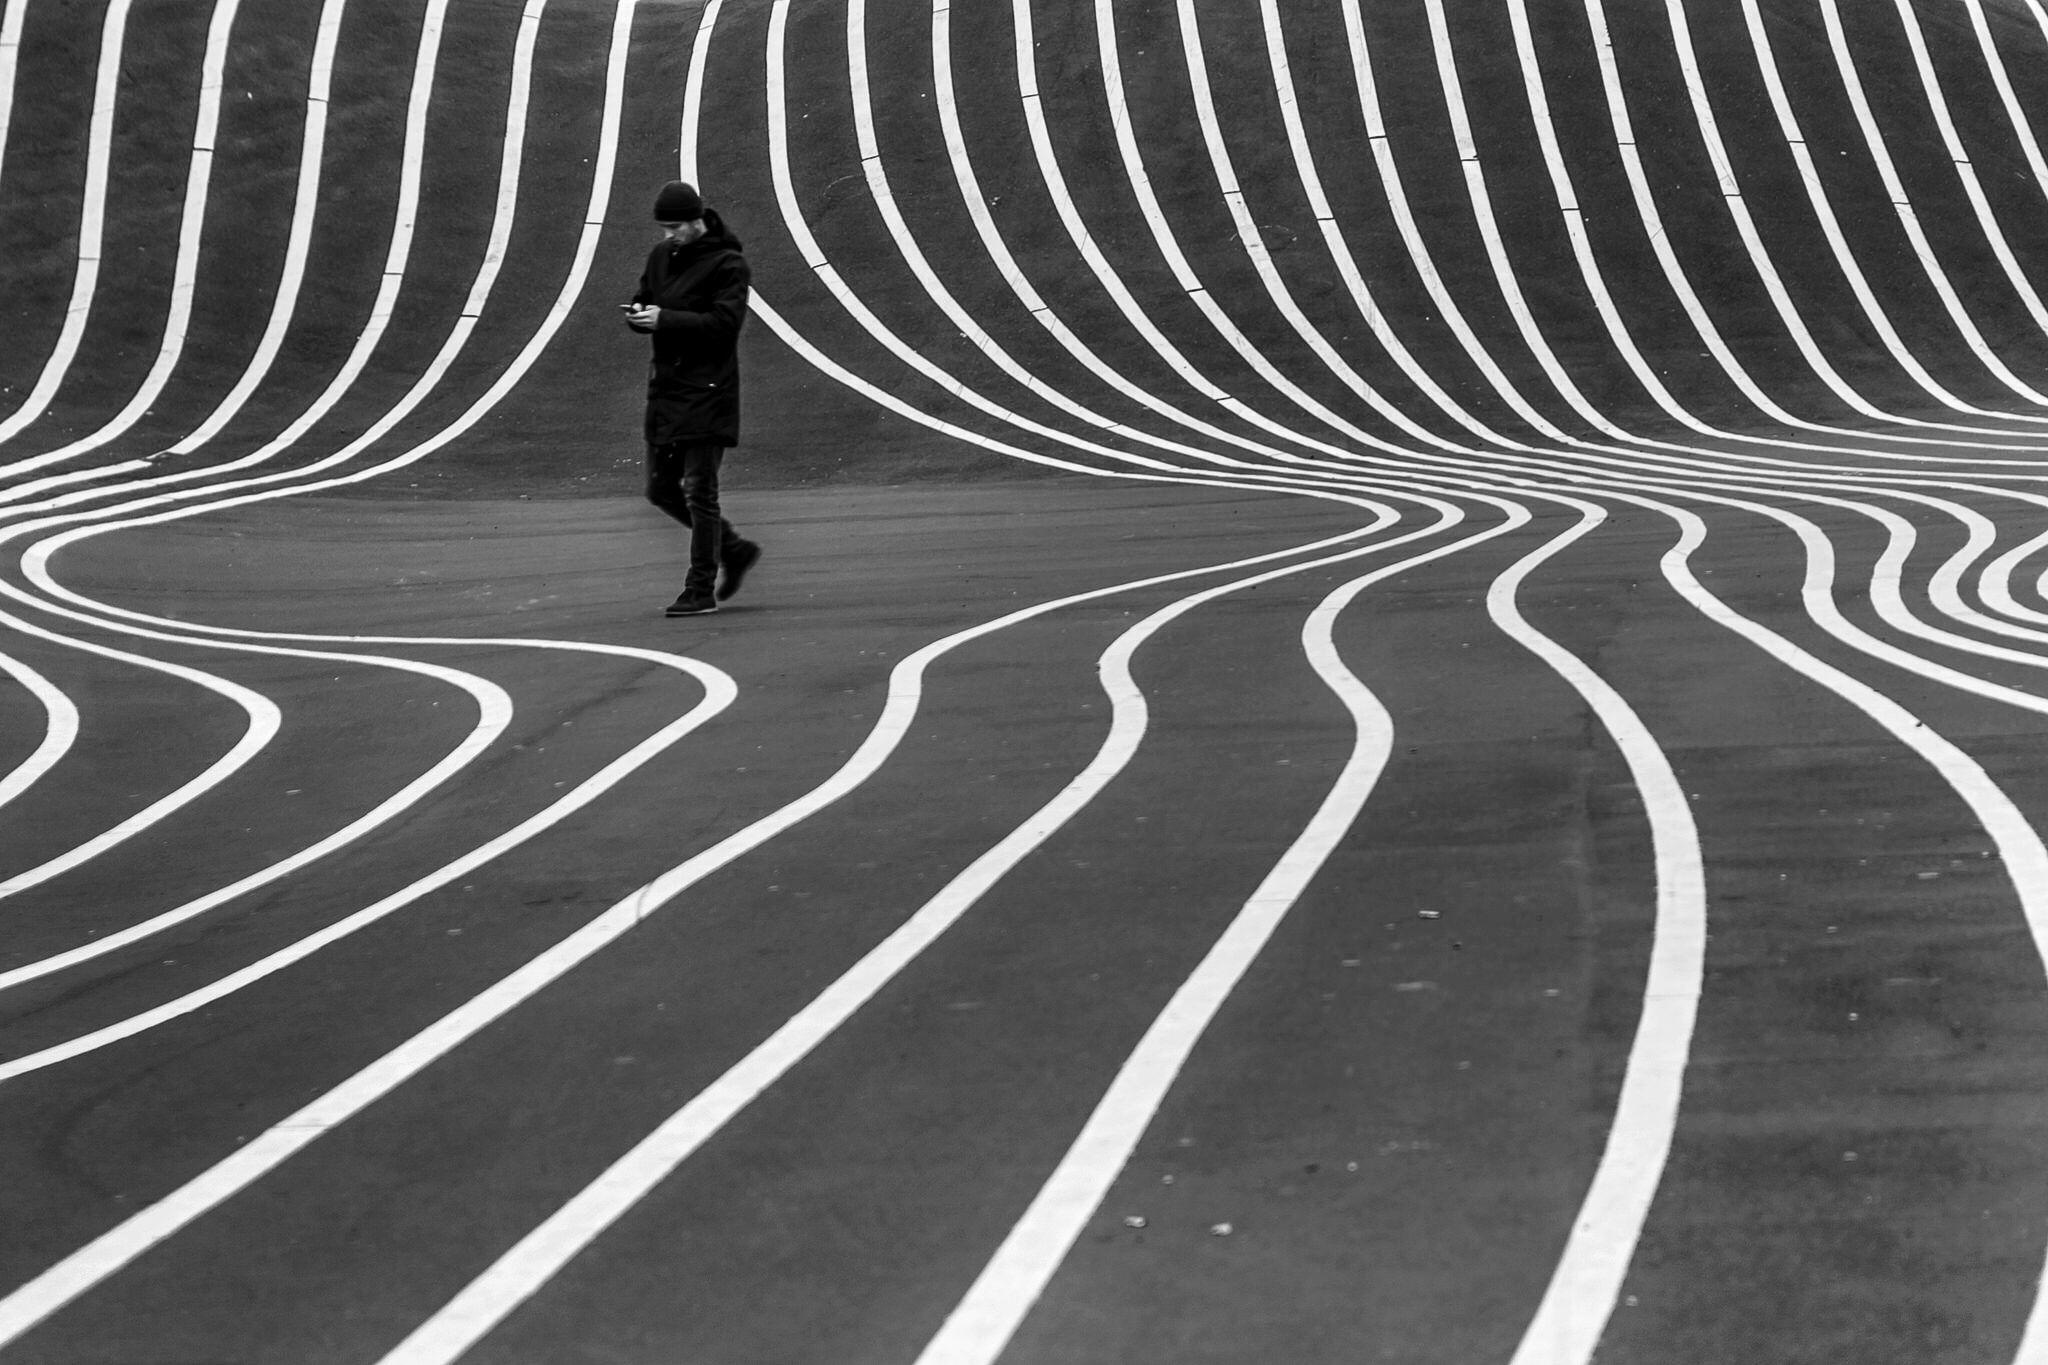 Copenaghen street photography